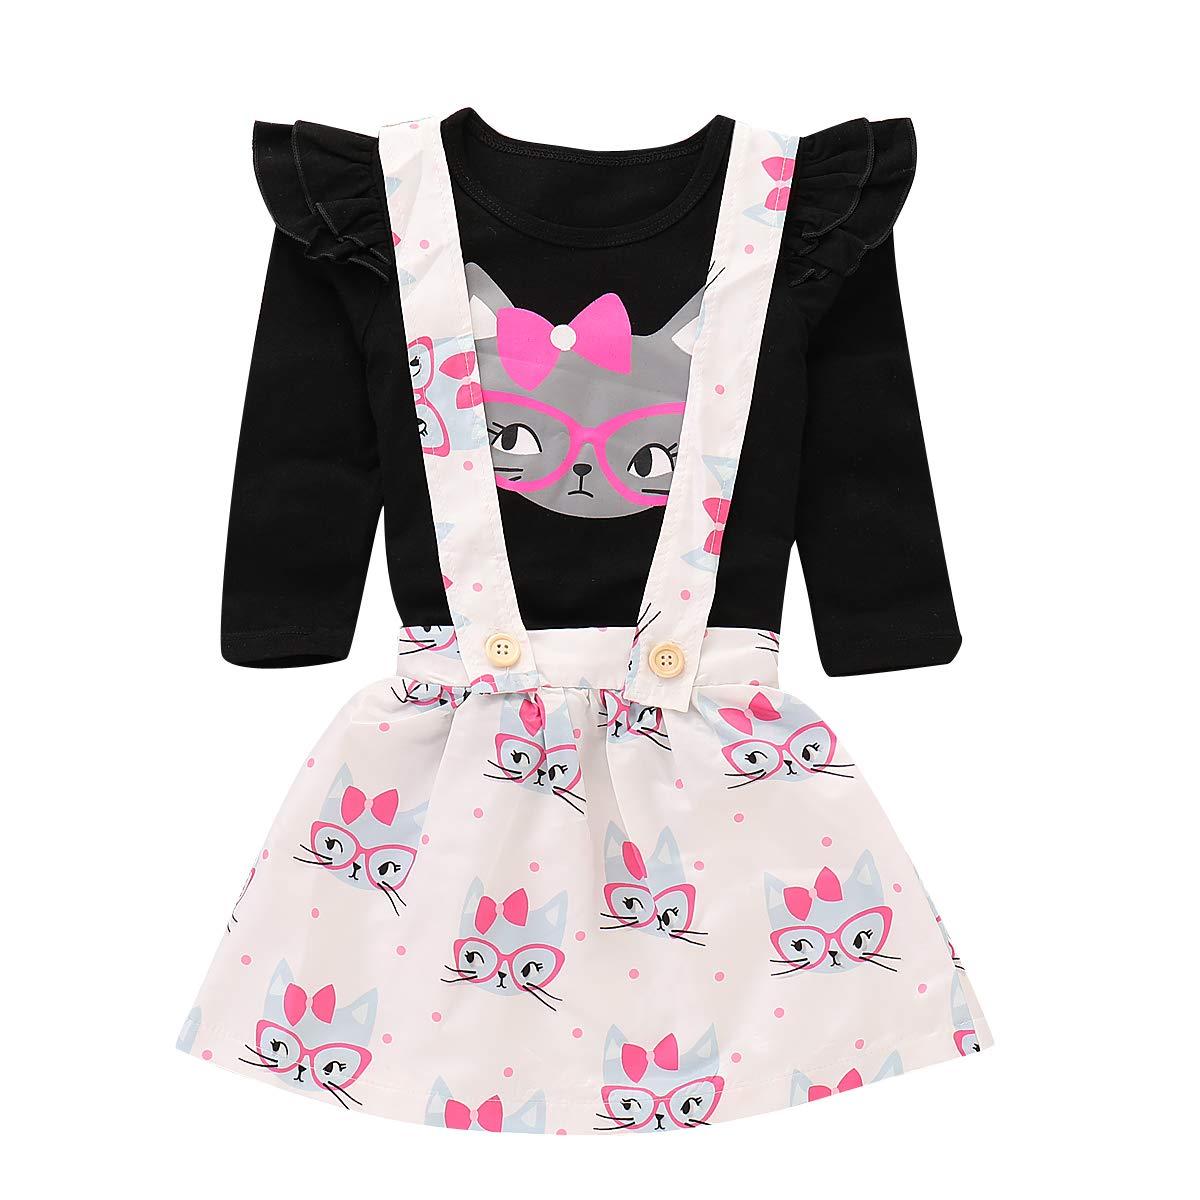 Toddler Baby Girls Cut Cat Ruffle Long Sleeve Shirt Tops Suspender Skirt Overalls Outfits